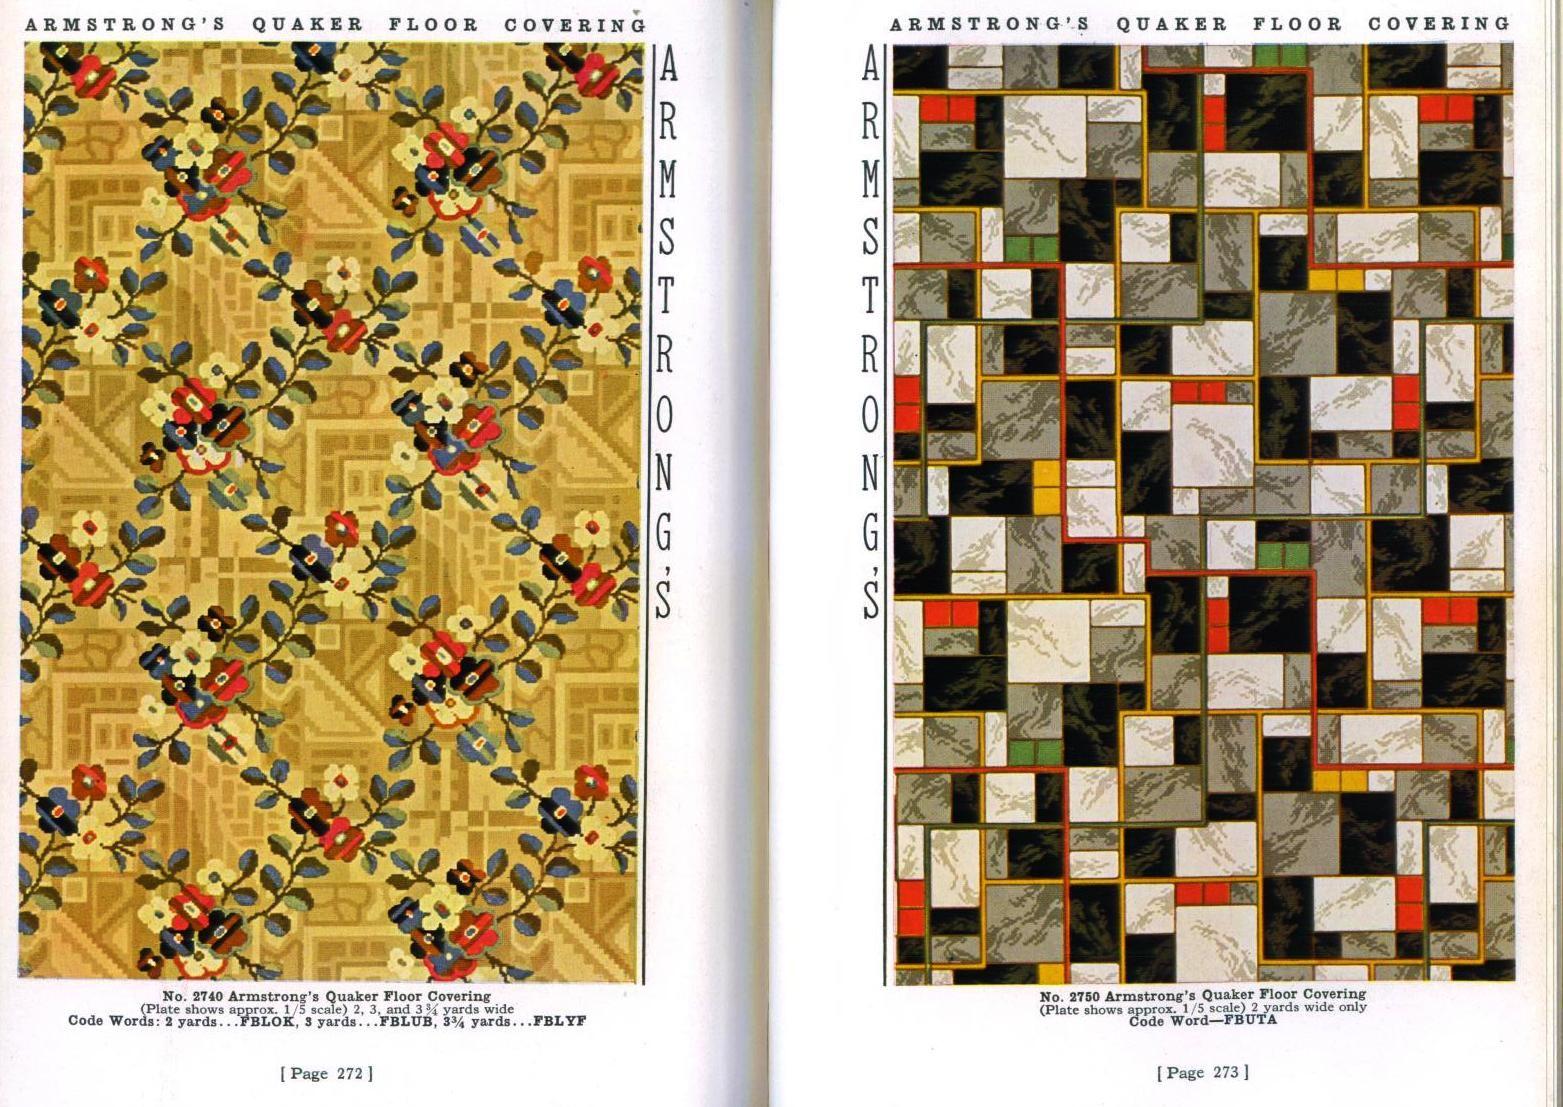 http://www.artdecoresource.com/2013/12/aromstrong-linoleum-1936-last-of-plaid.html